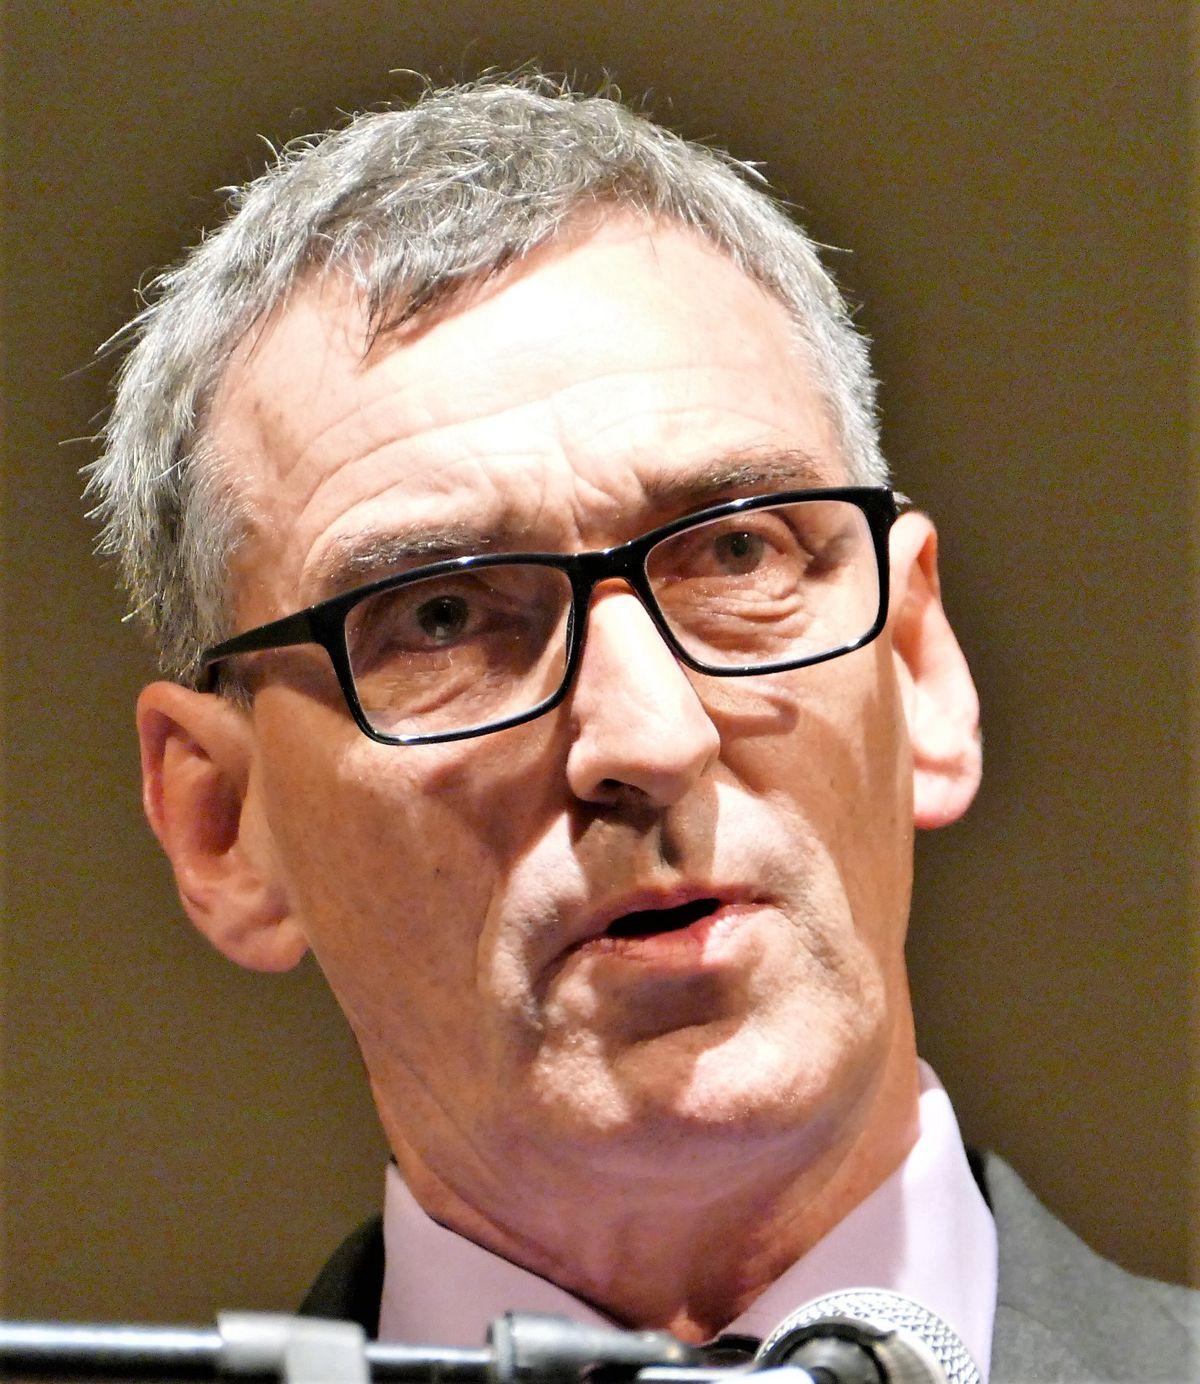 Alderney politician Kevin Gentle. (Picture by David Nash, 29238041)